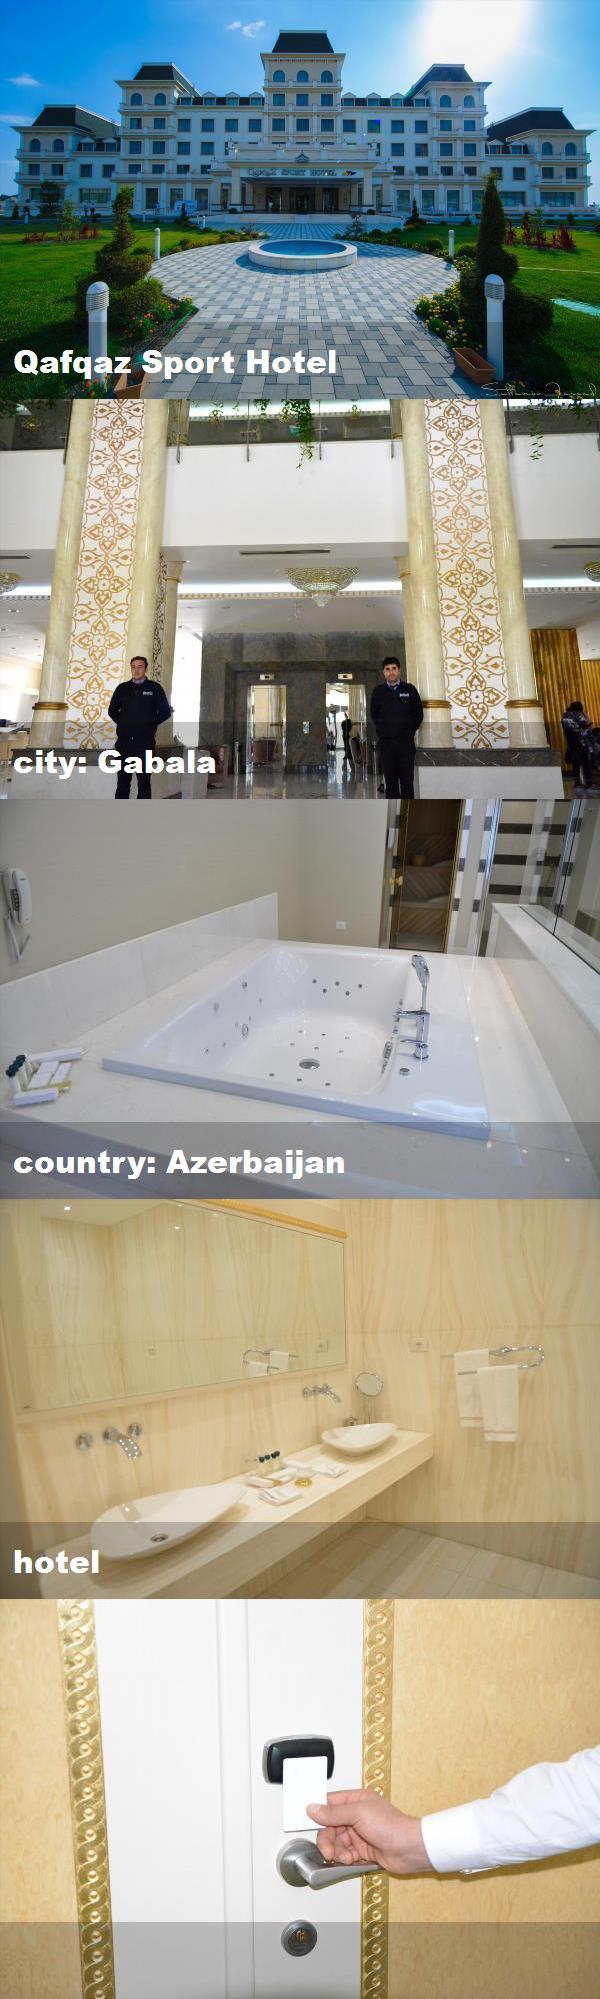 Qafqaz Sport Hotel City Gabala Country Azerbaijan Hotel Hotel Indoor Pool Country